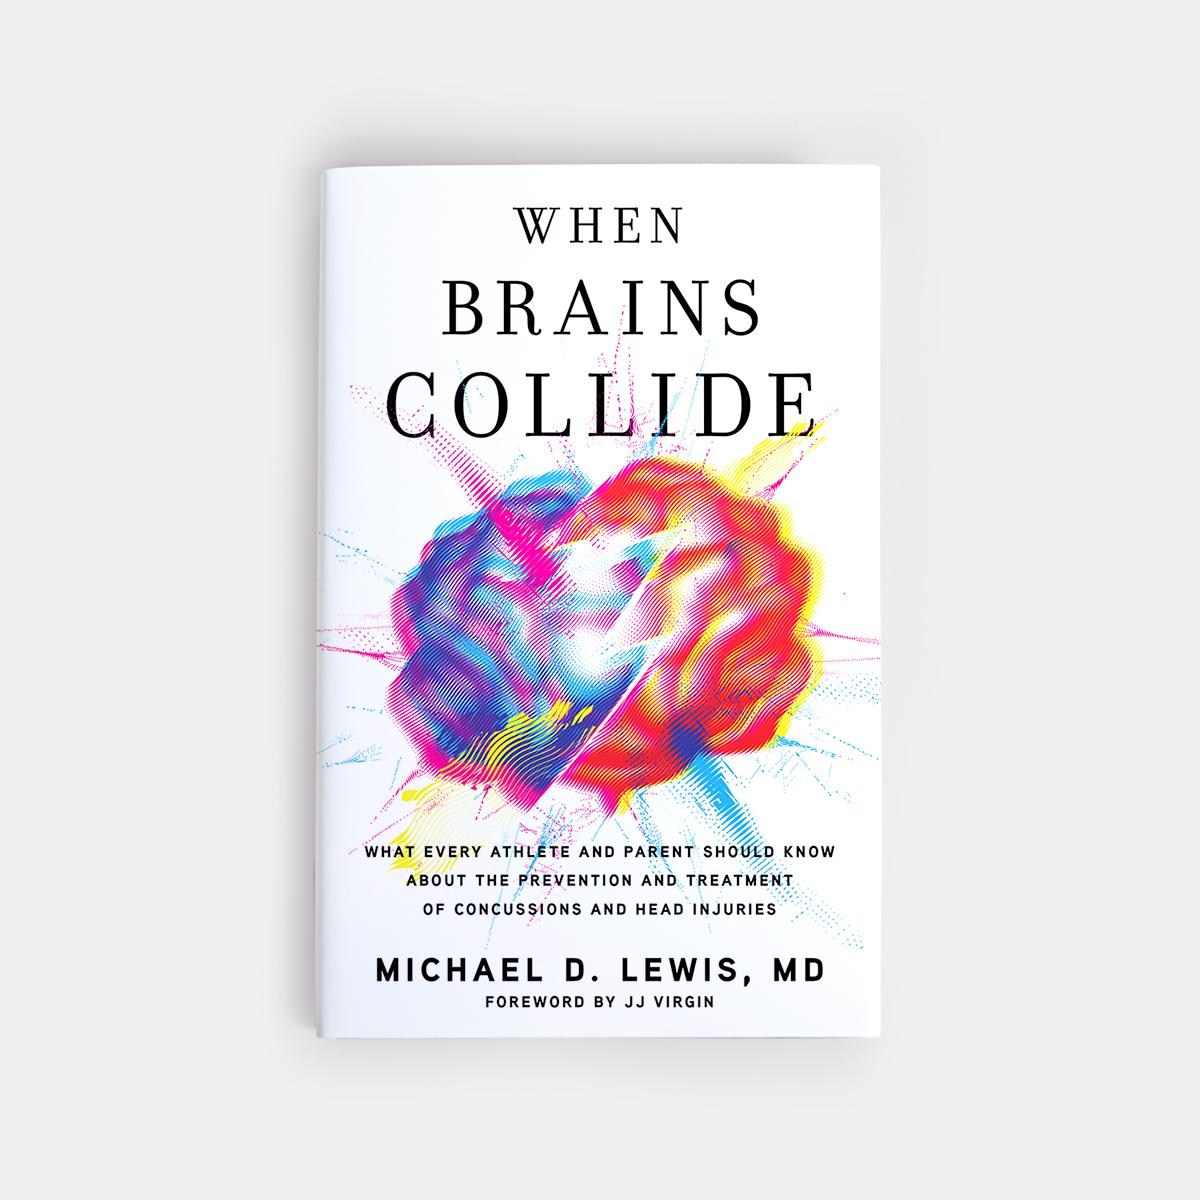 When Brains Collide - annadorfman.com